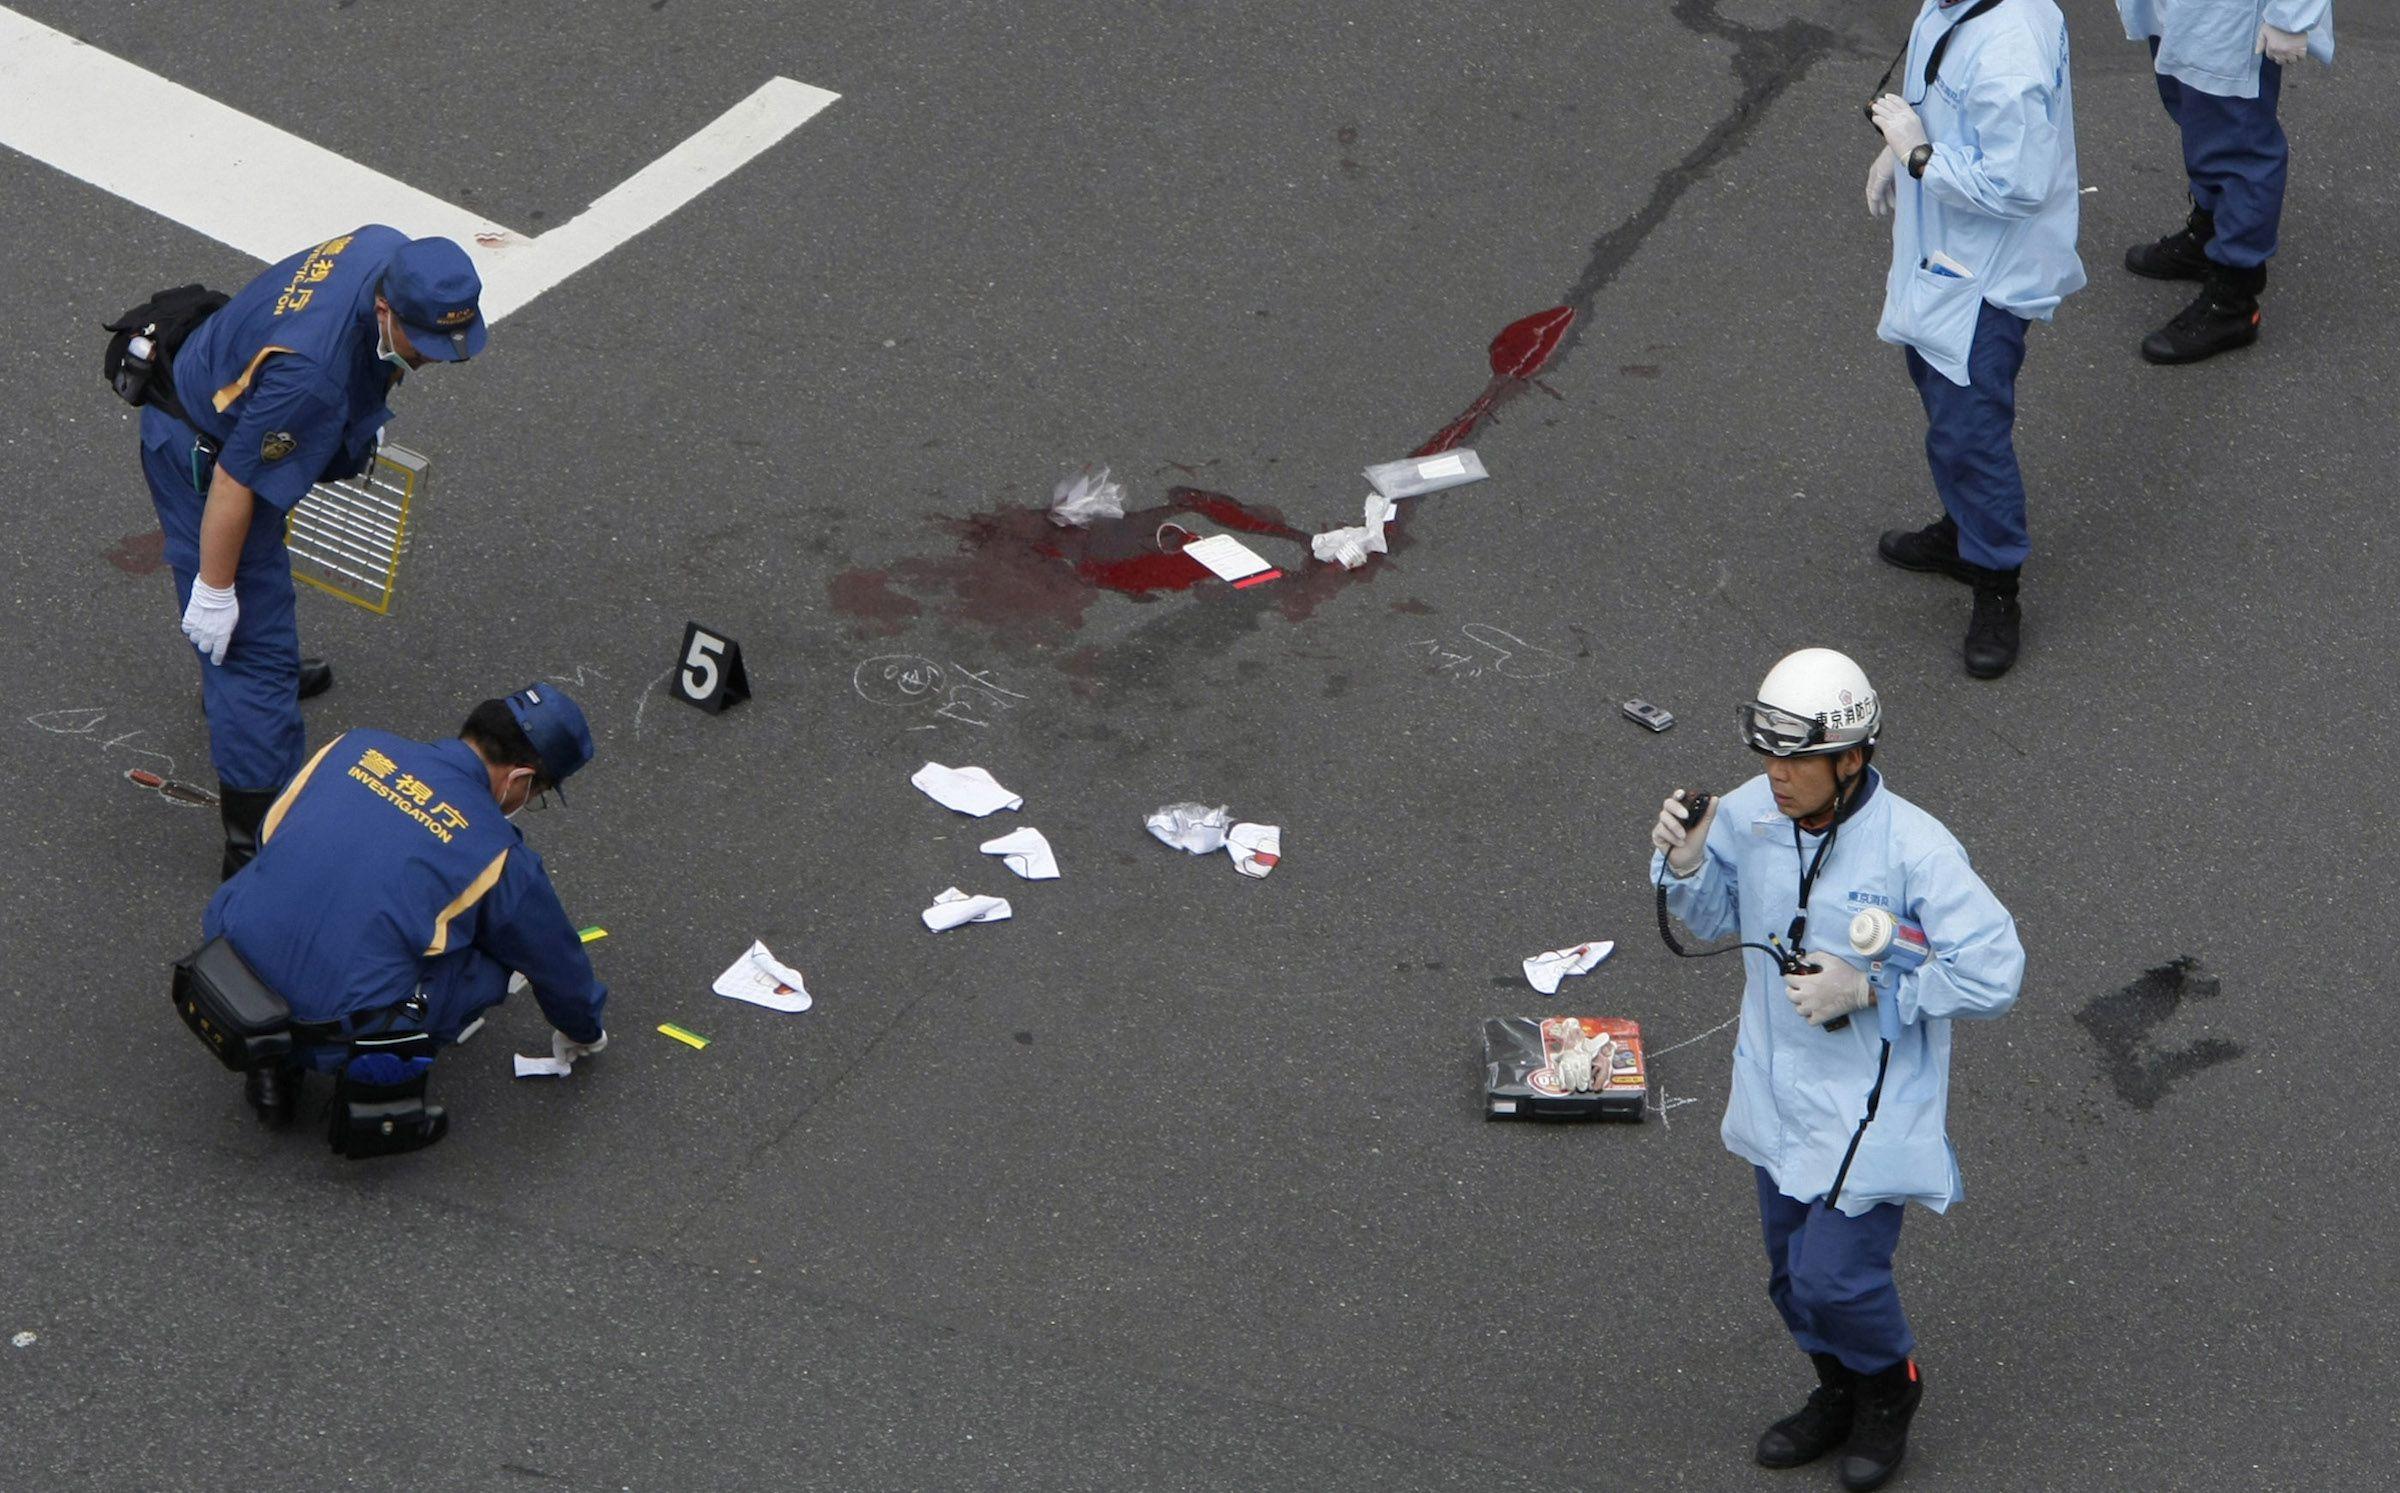 Stabbing in Japan